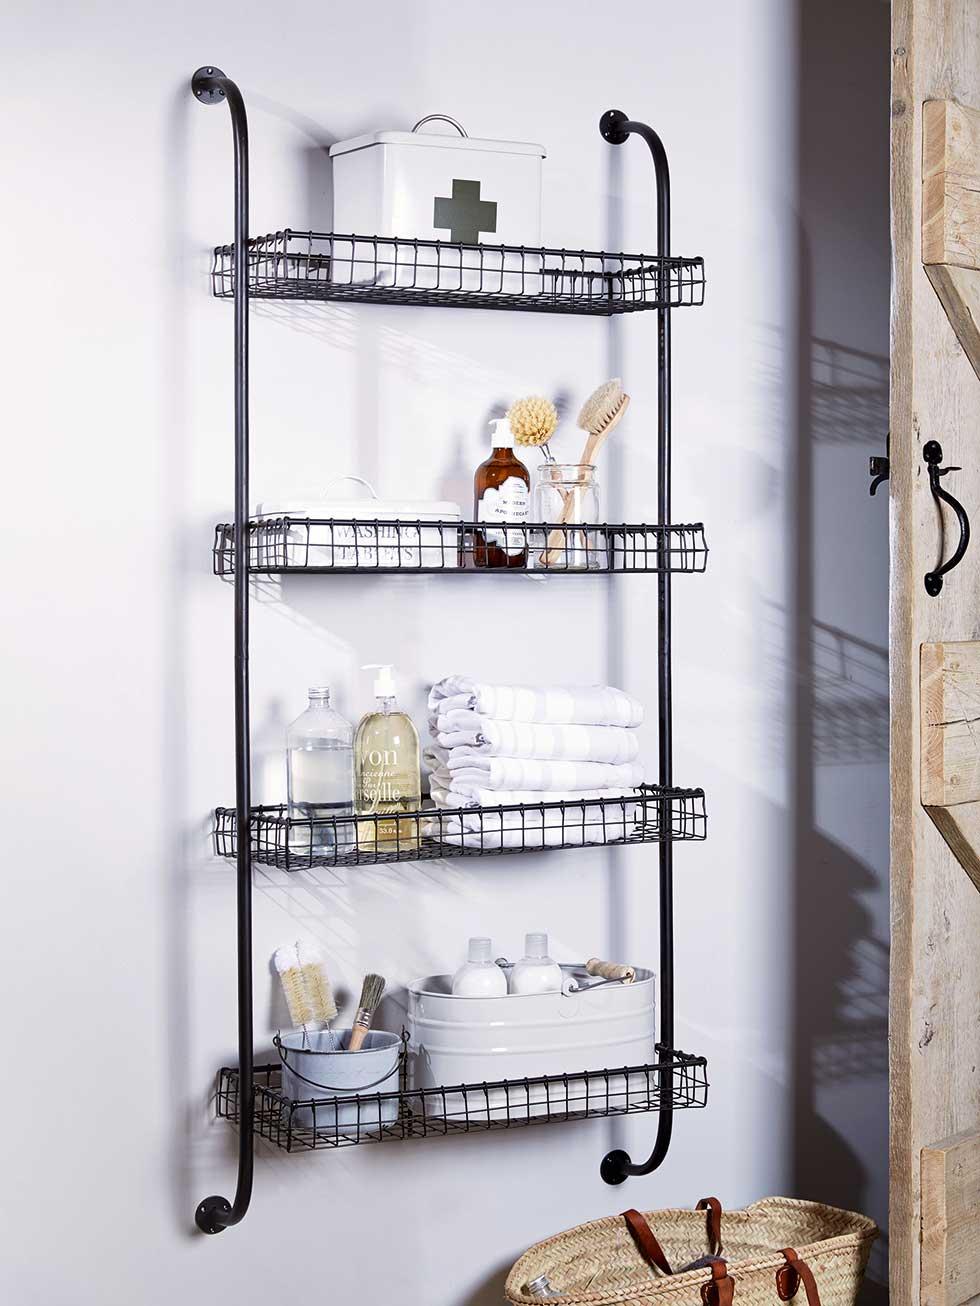 for bathroom shelf timber floating like of this wood photo wooden storage item shelves kitchen organizer